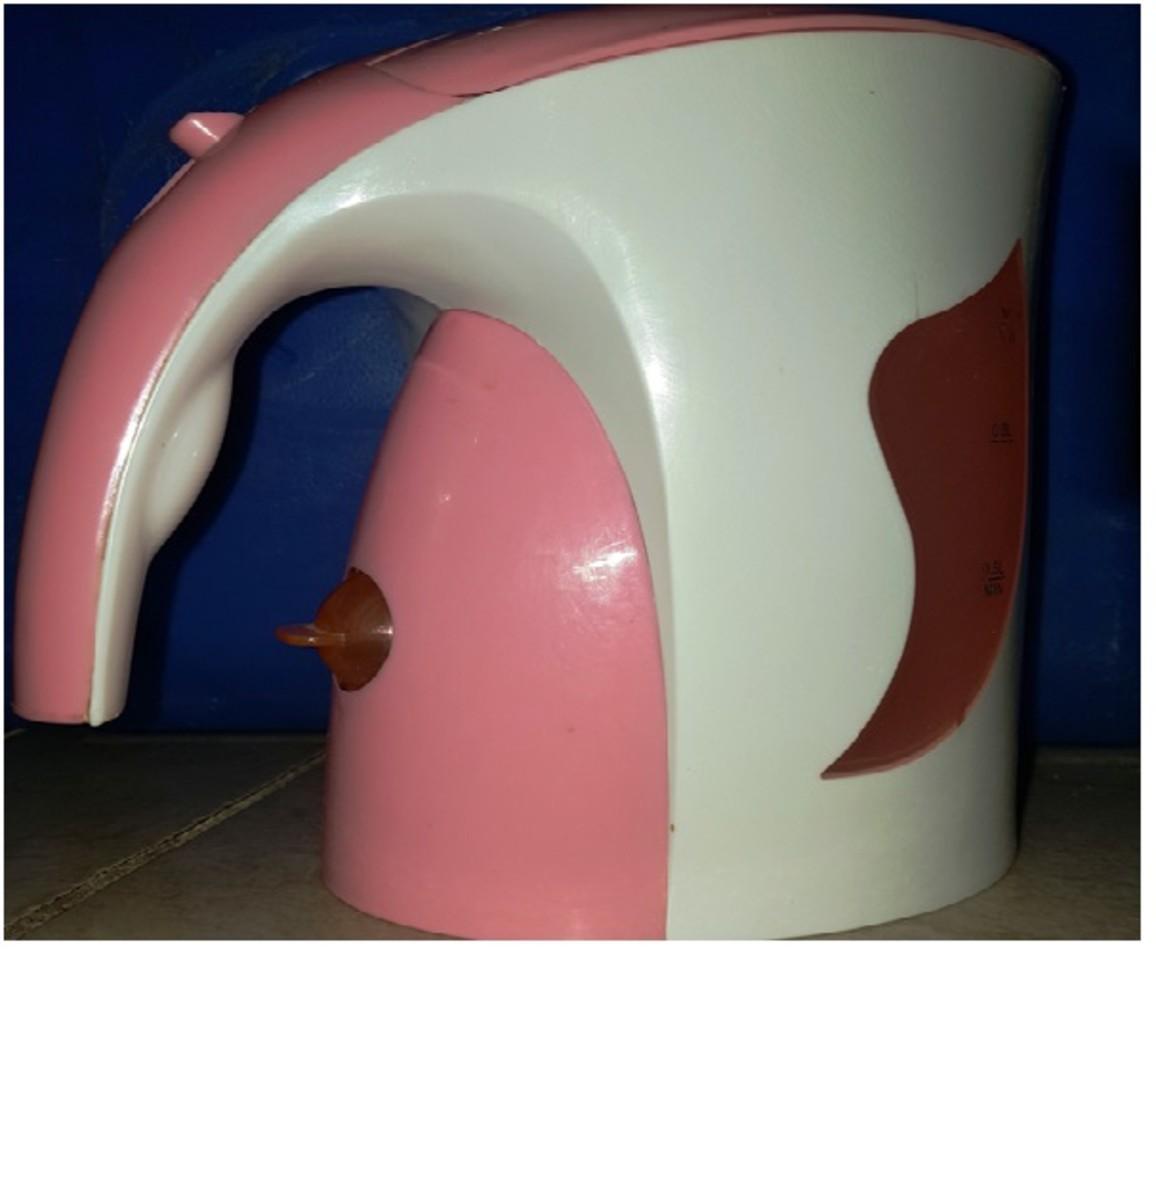 Pink Kettle (Water Heater Jug)